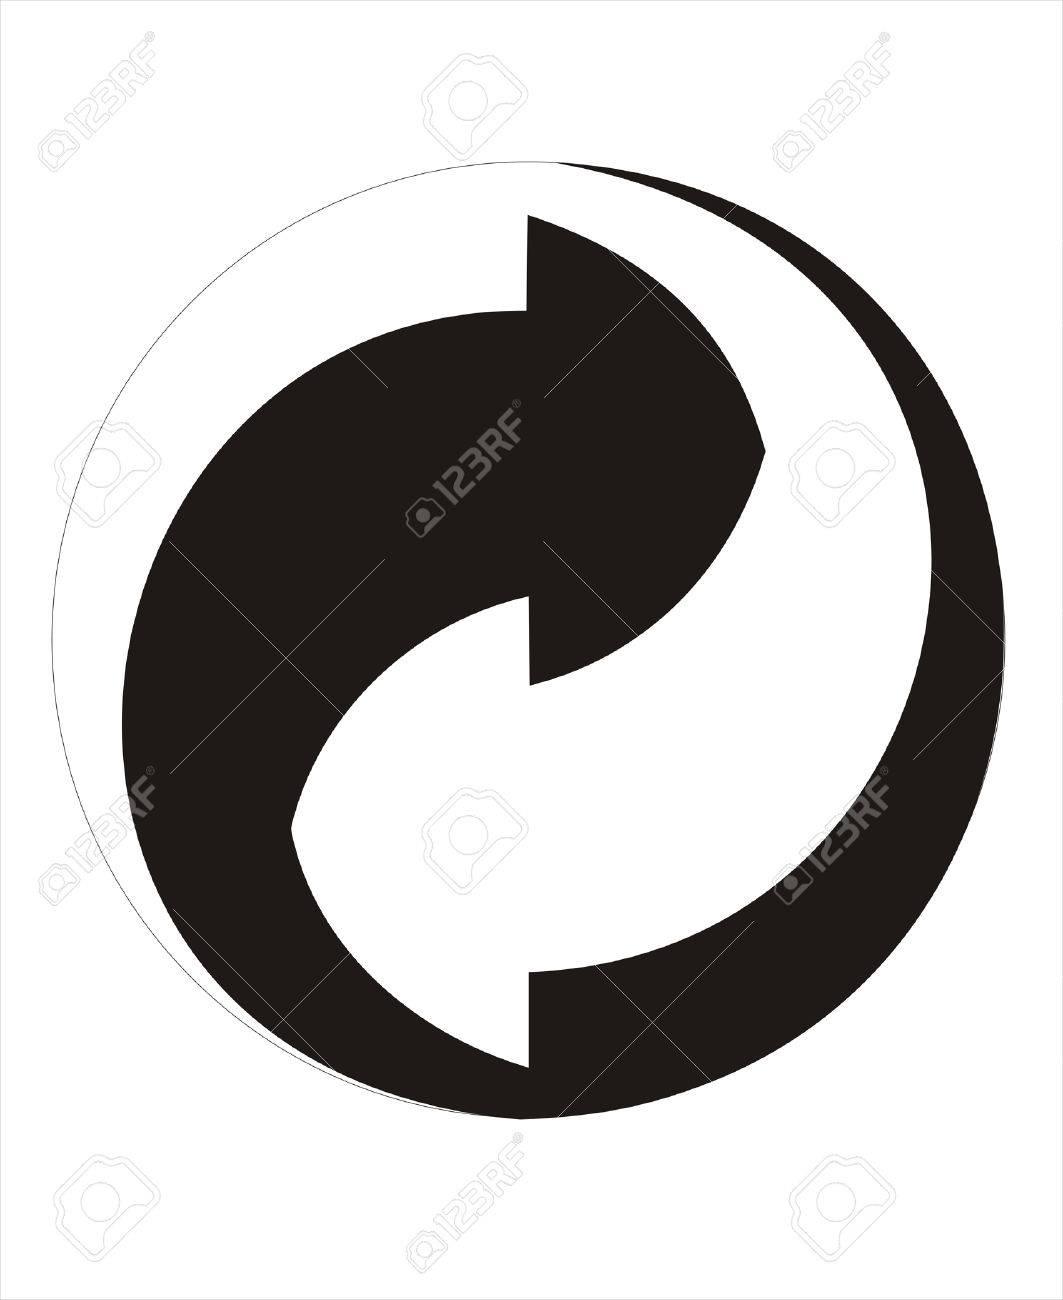 Der Grune Punkt Recycle Sign Stock Vector - 4316222